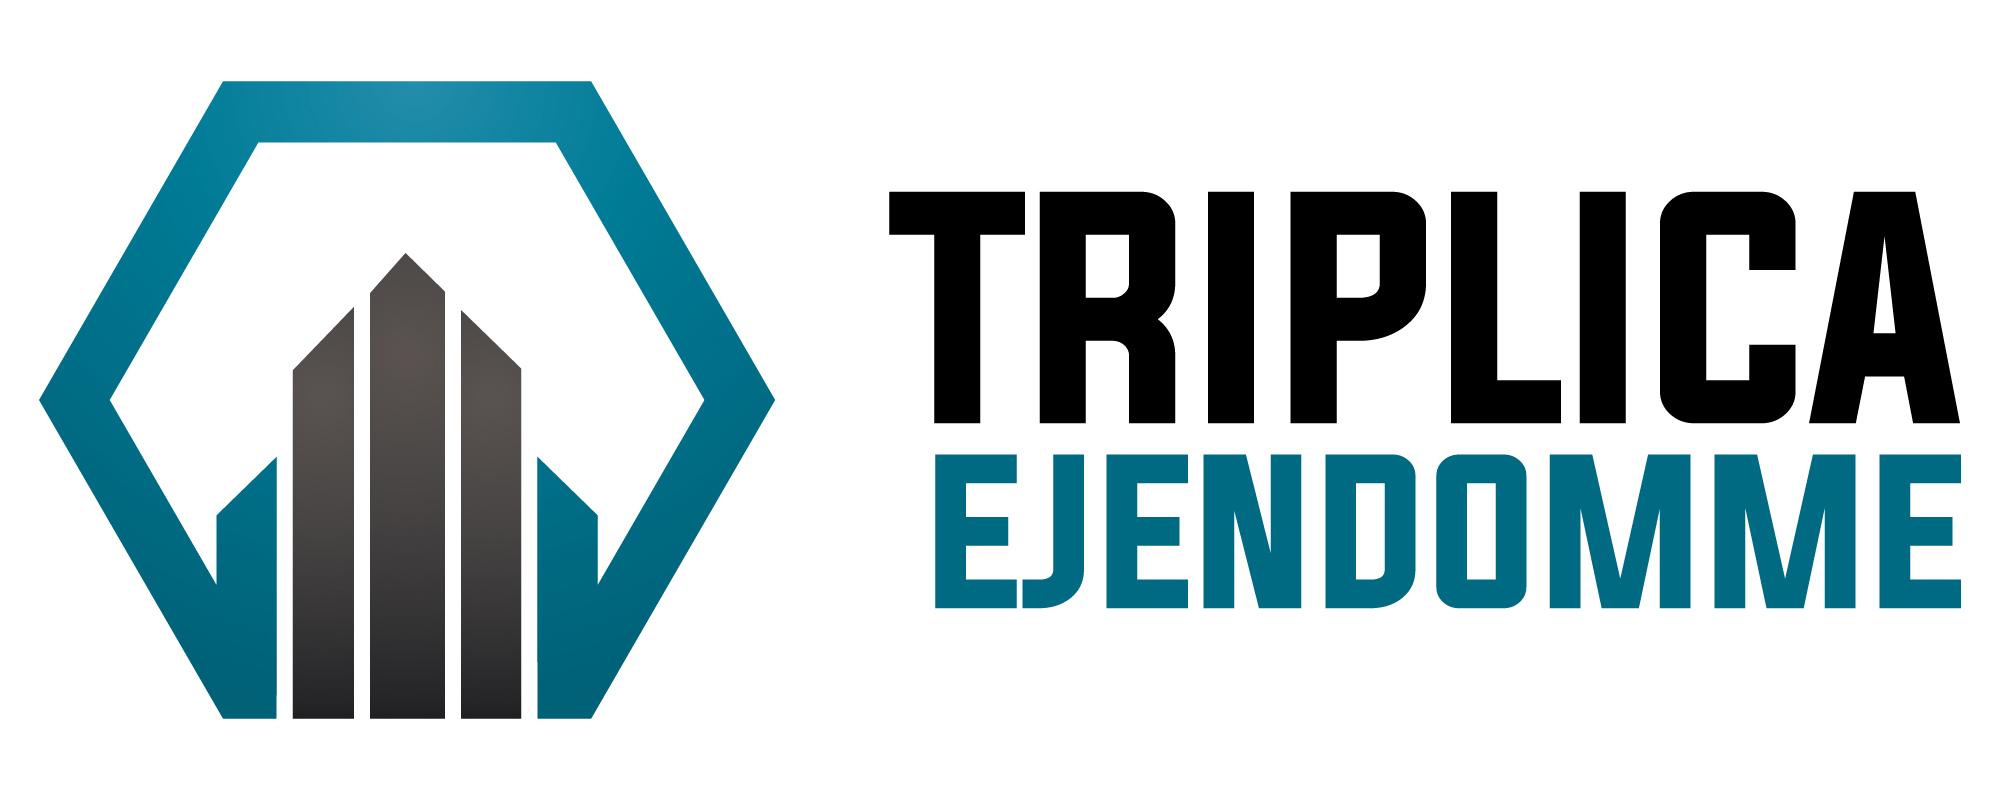 Triplica Ejendomme logo sponsorere Jonathan Weywadt Martin Friis